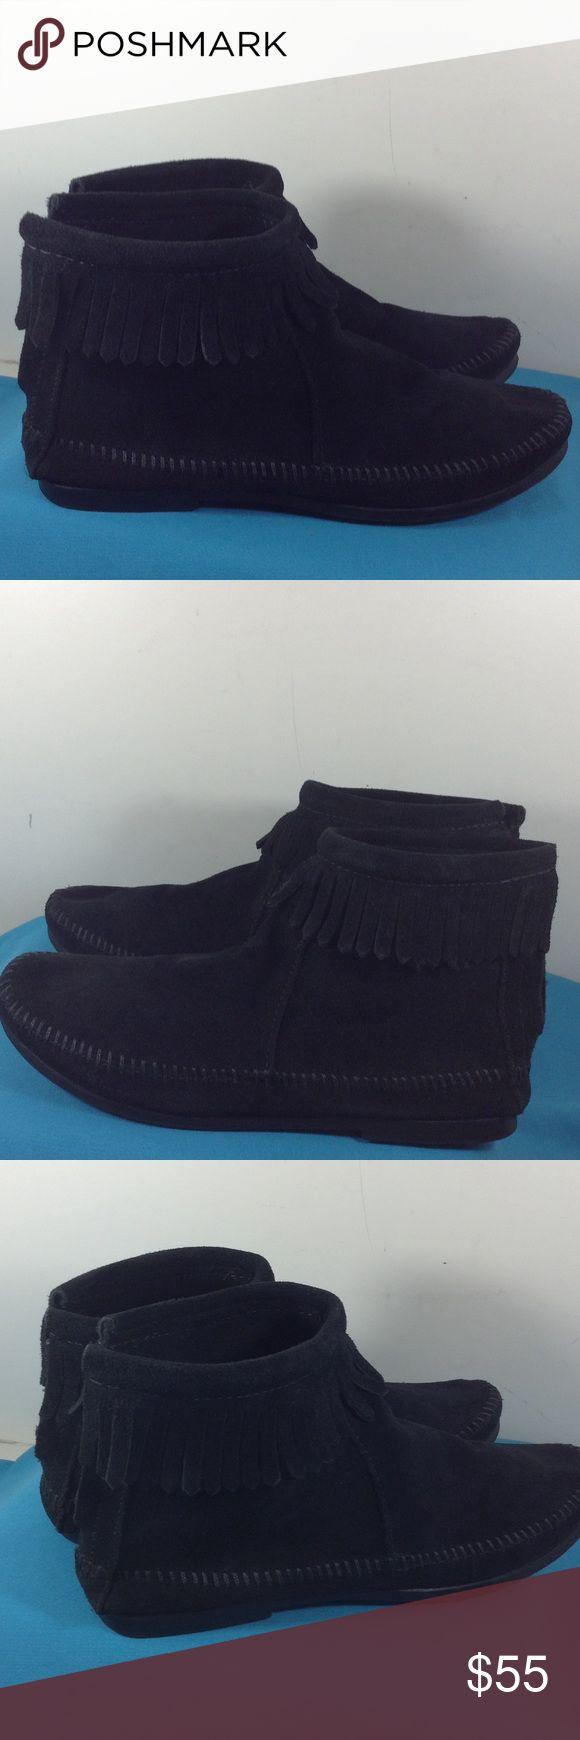 MINNETONKA MOCCASIN  Ankle boot black size 8 Use Very good condition MINNETONKA  MOCCASIN ankle boot size 8 Minnetonka Shoes Ankle Boots & Booties